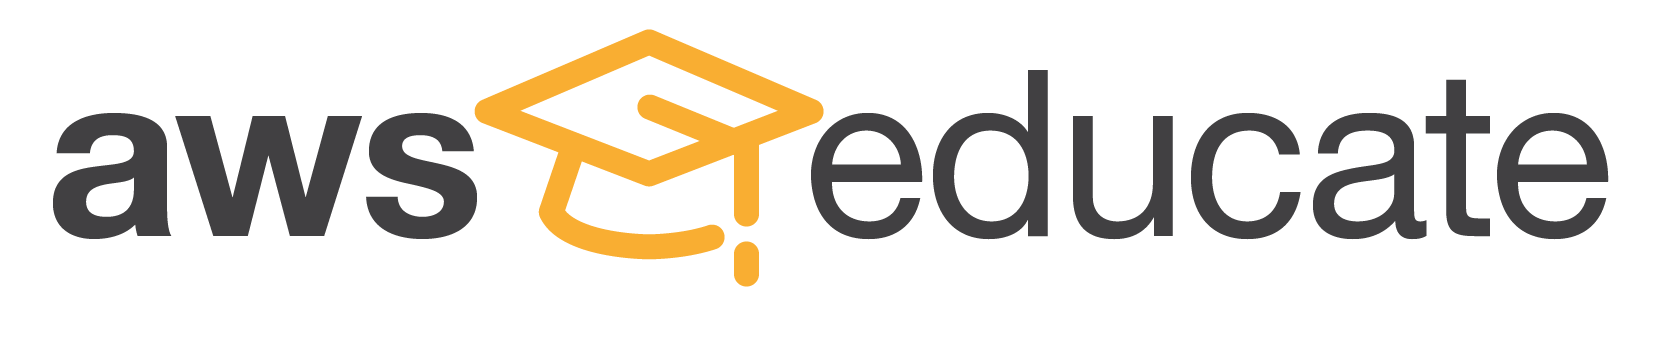 aws-educate-logo.png